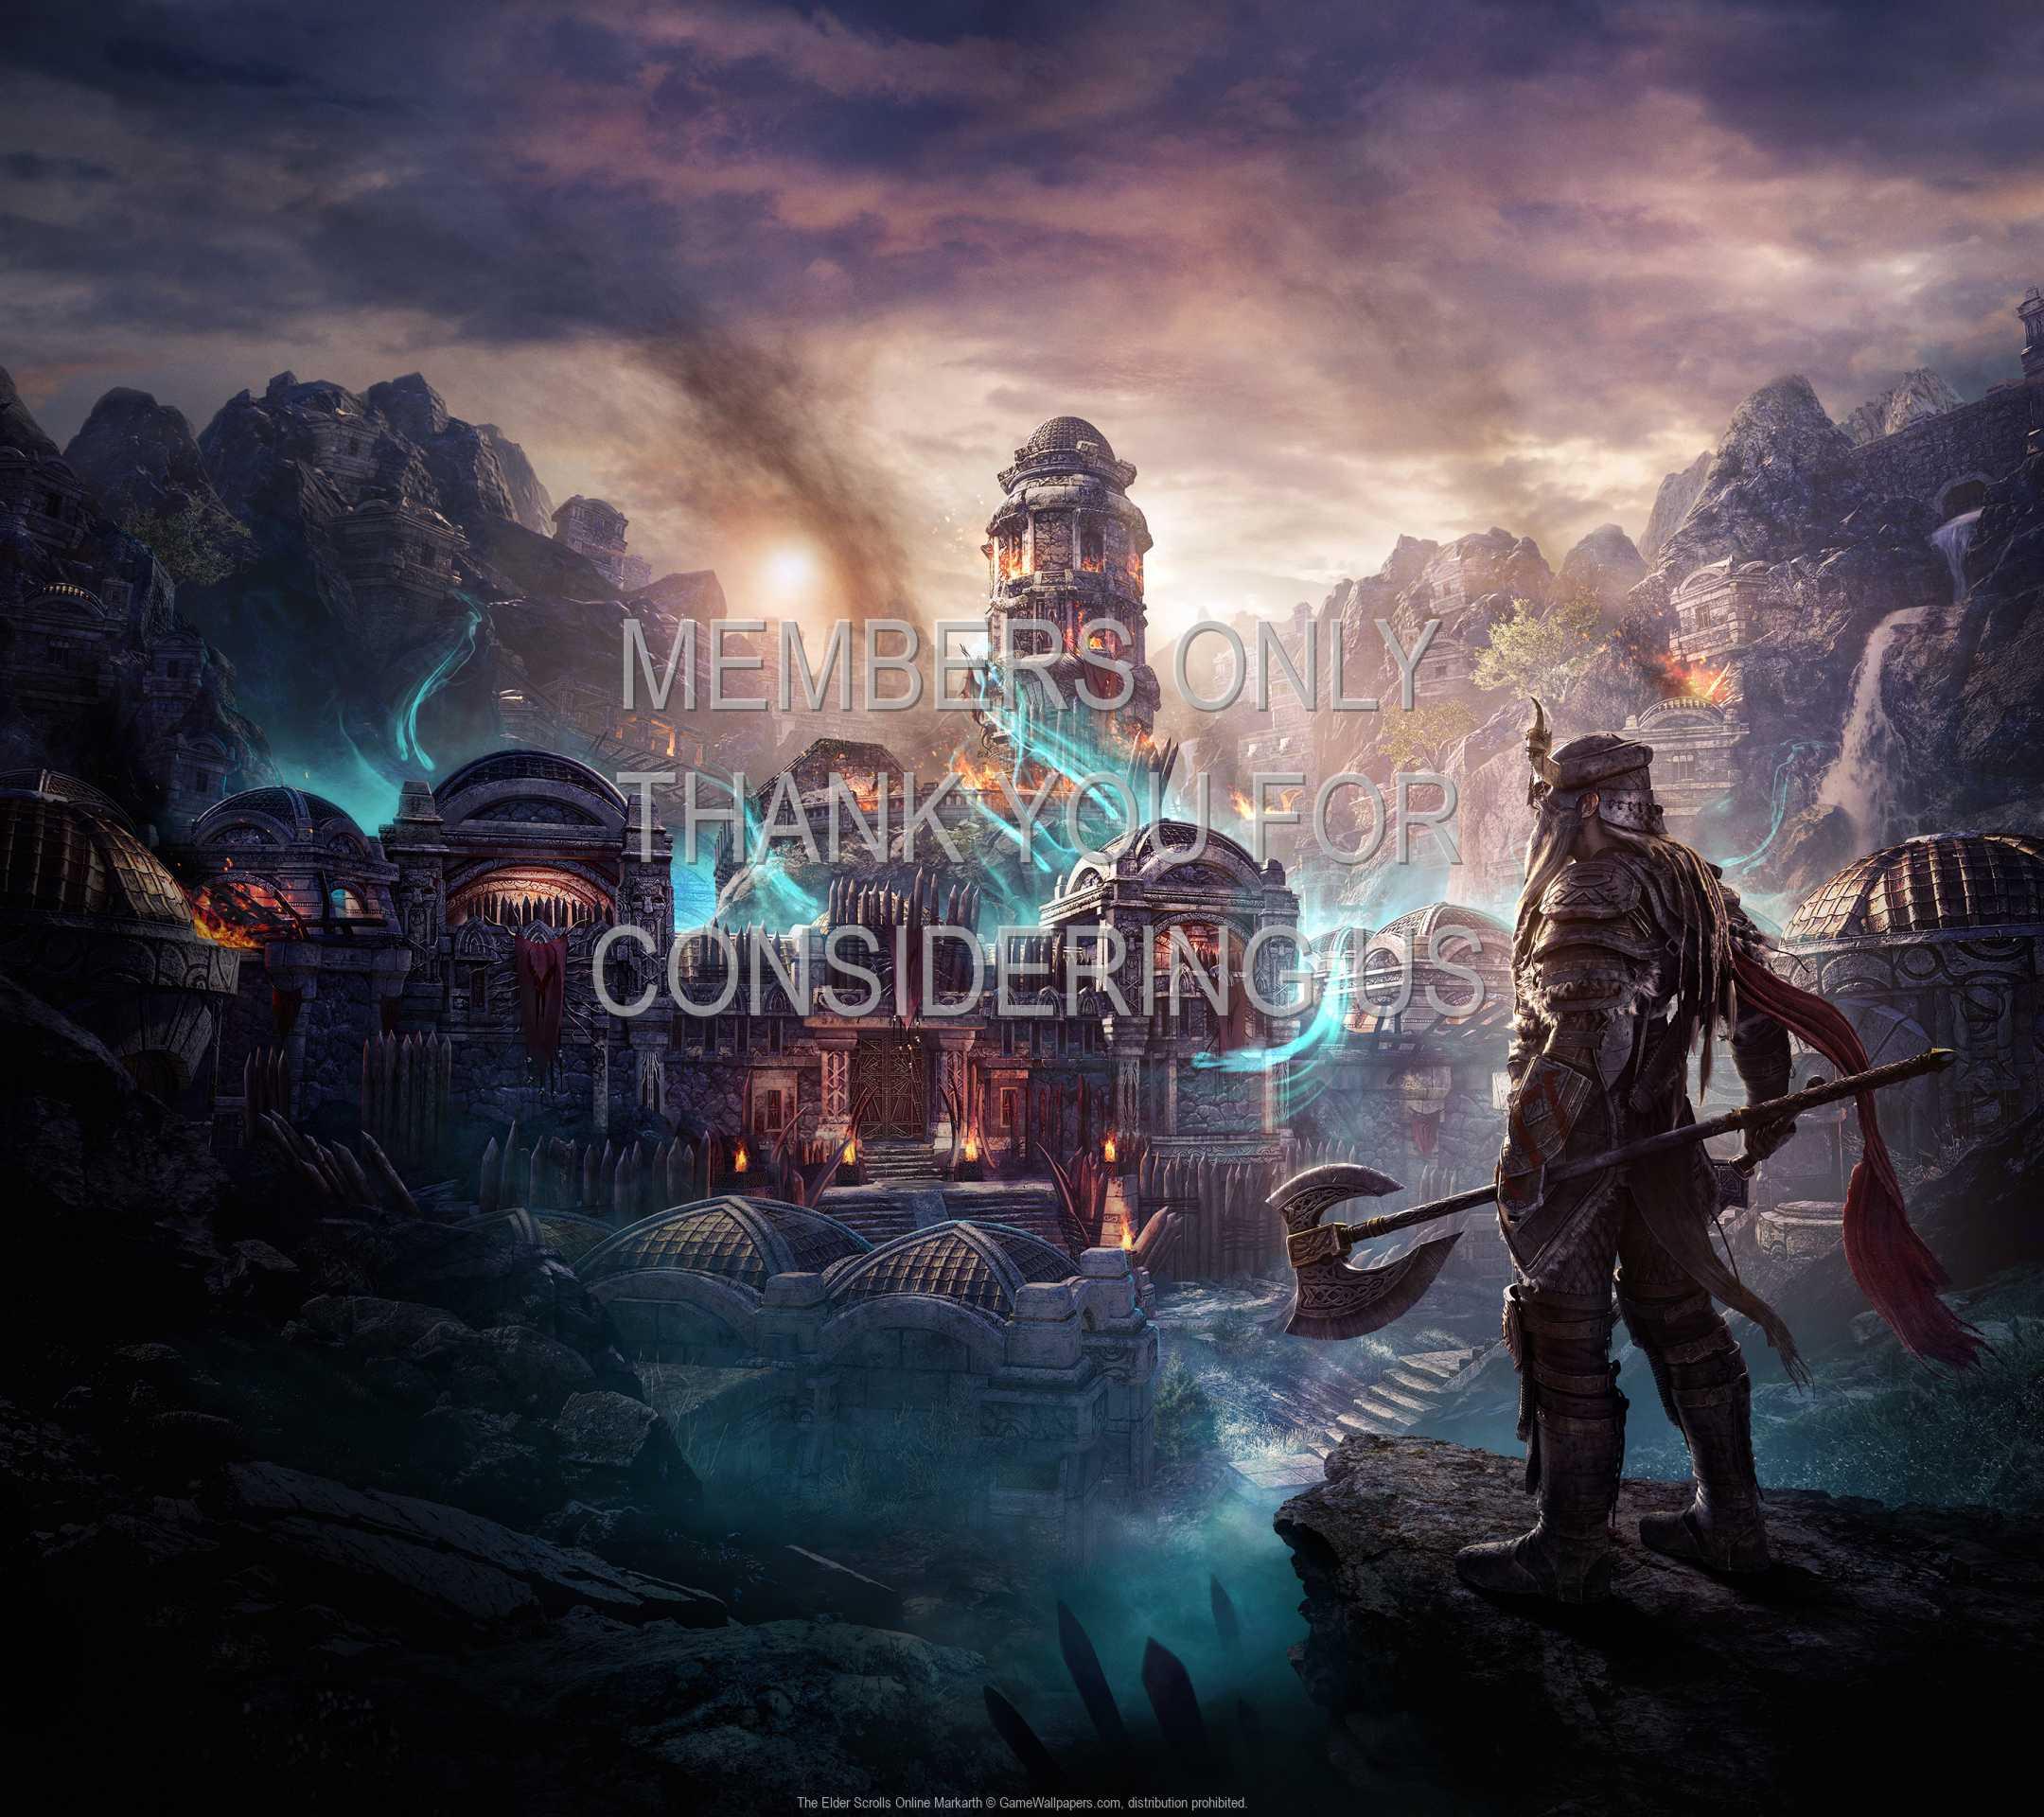 The Elder Scrolls Online: Markarth 1080p Horizontal Mobile wallpaper or background 01